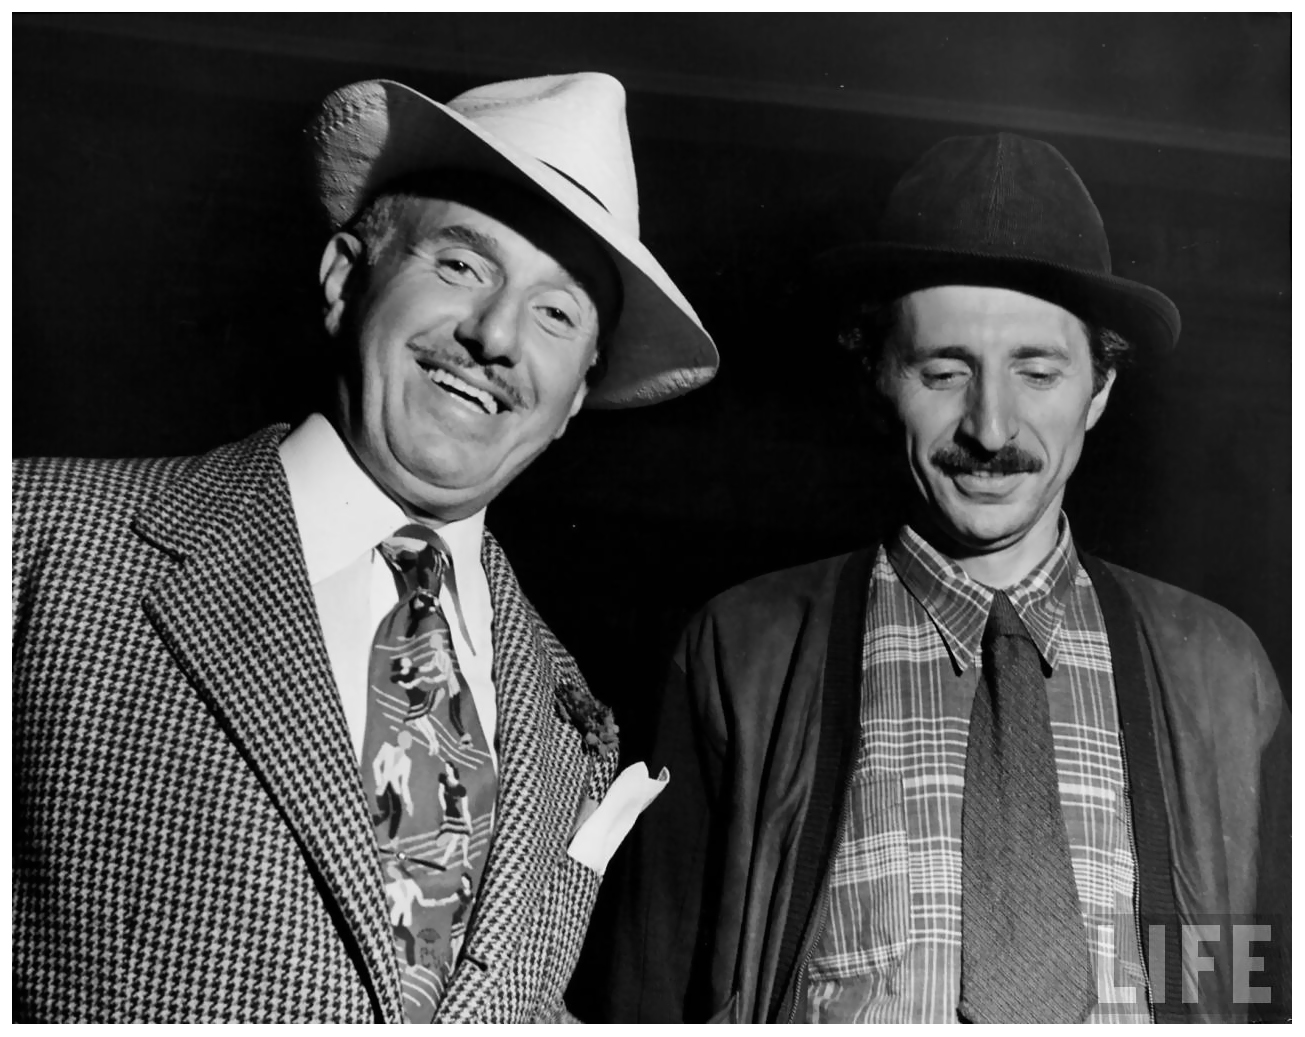 photographer-gjon-mili-r-w-warner-bros-studios-head-jack-l-warner-on-set-of-22jammin-the-blues22-film-being-directed-by-mili-1944.jpeg